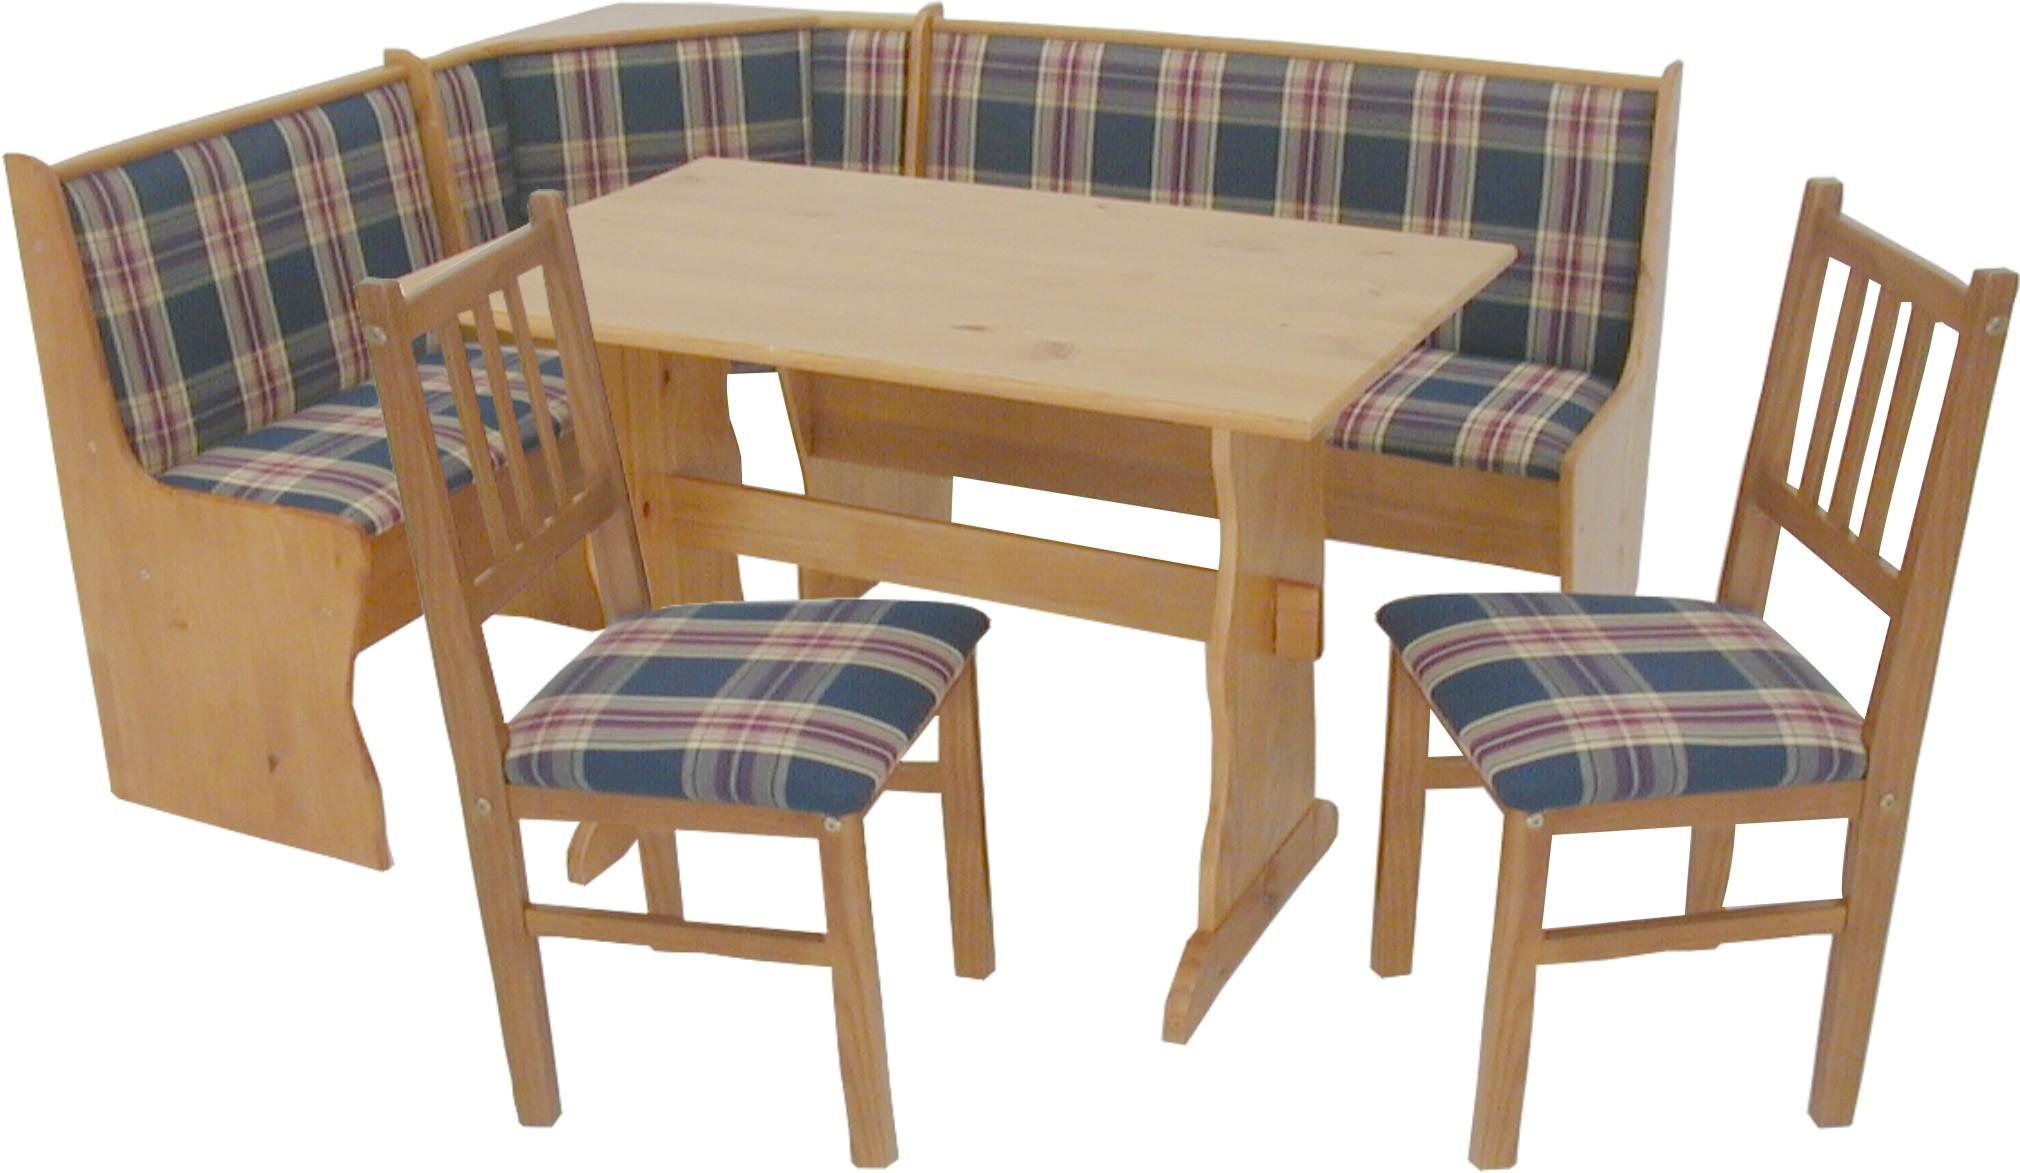 Kitchen tables round photo - 2